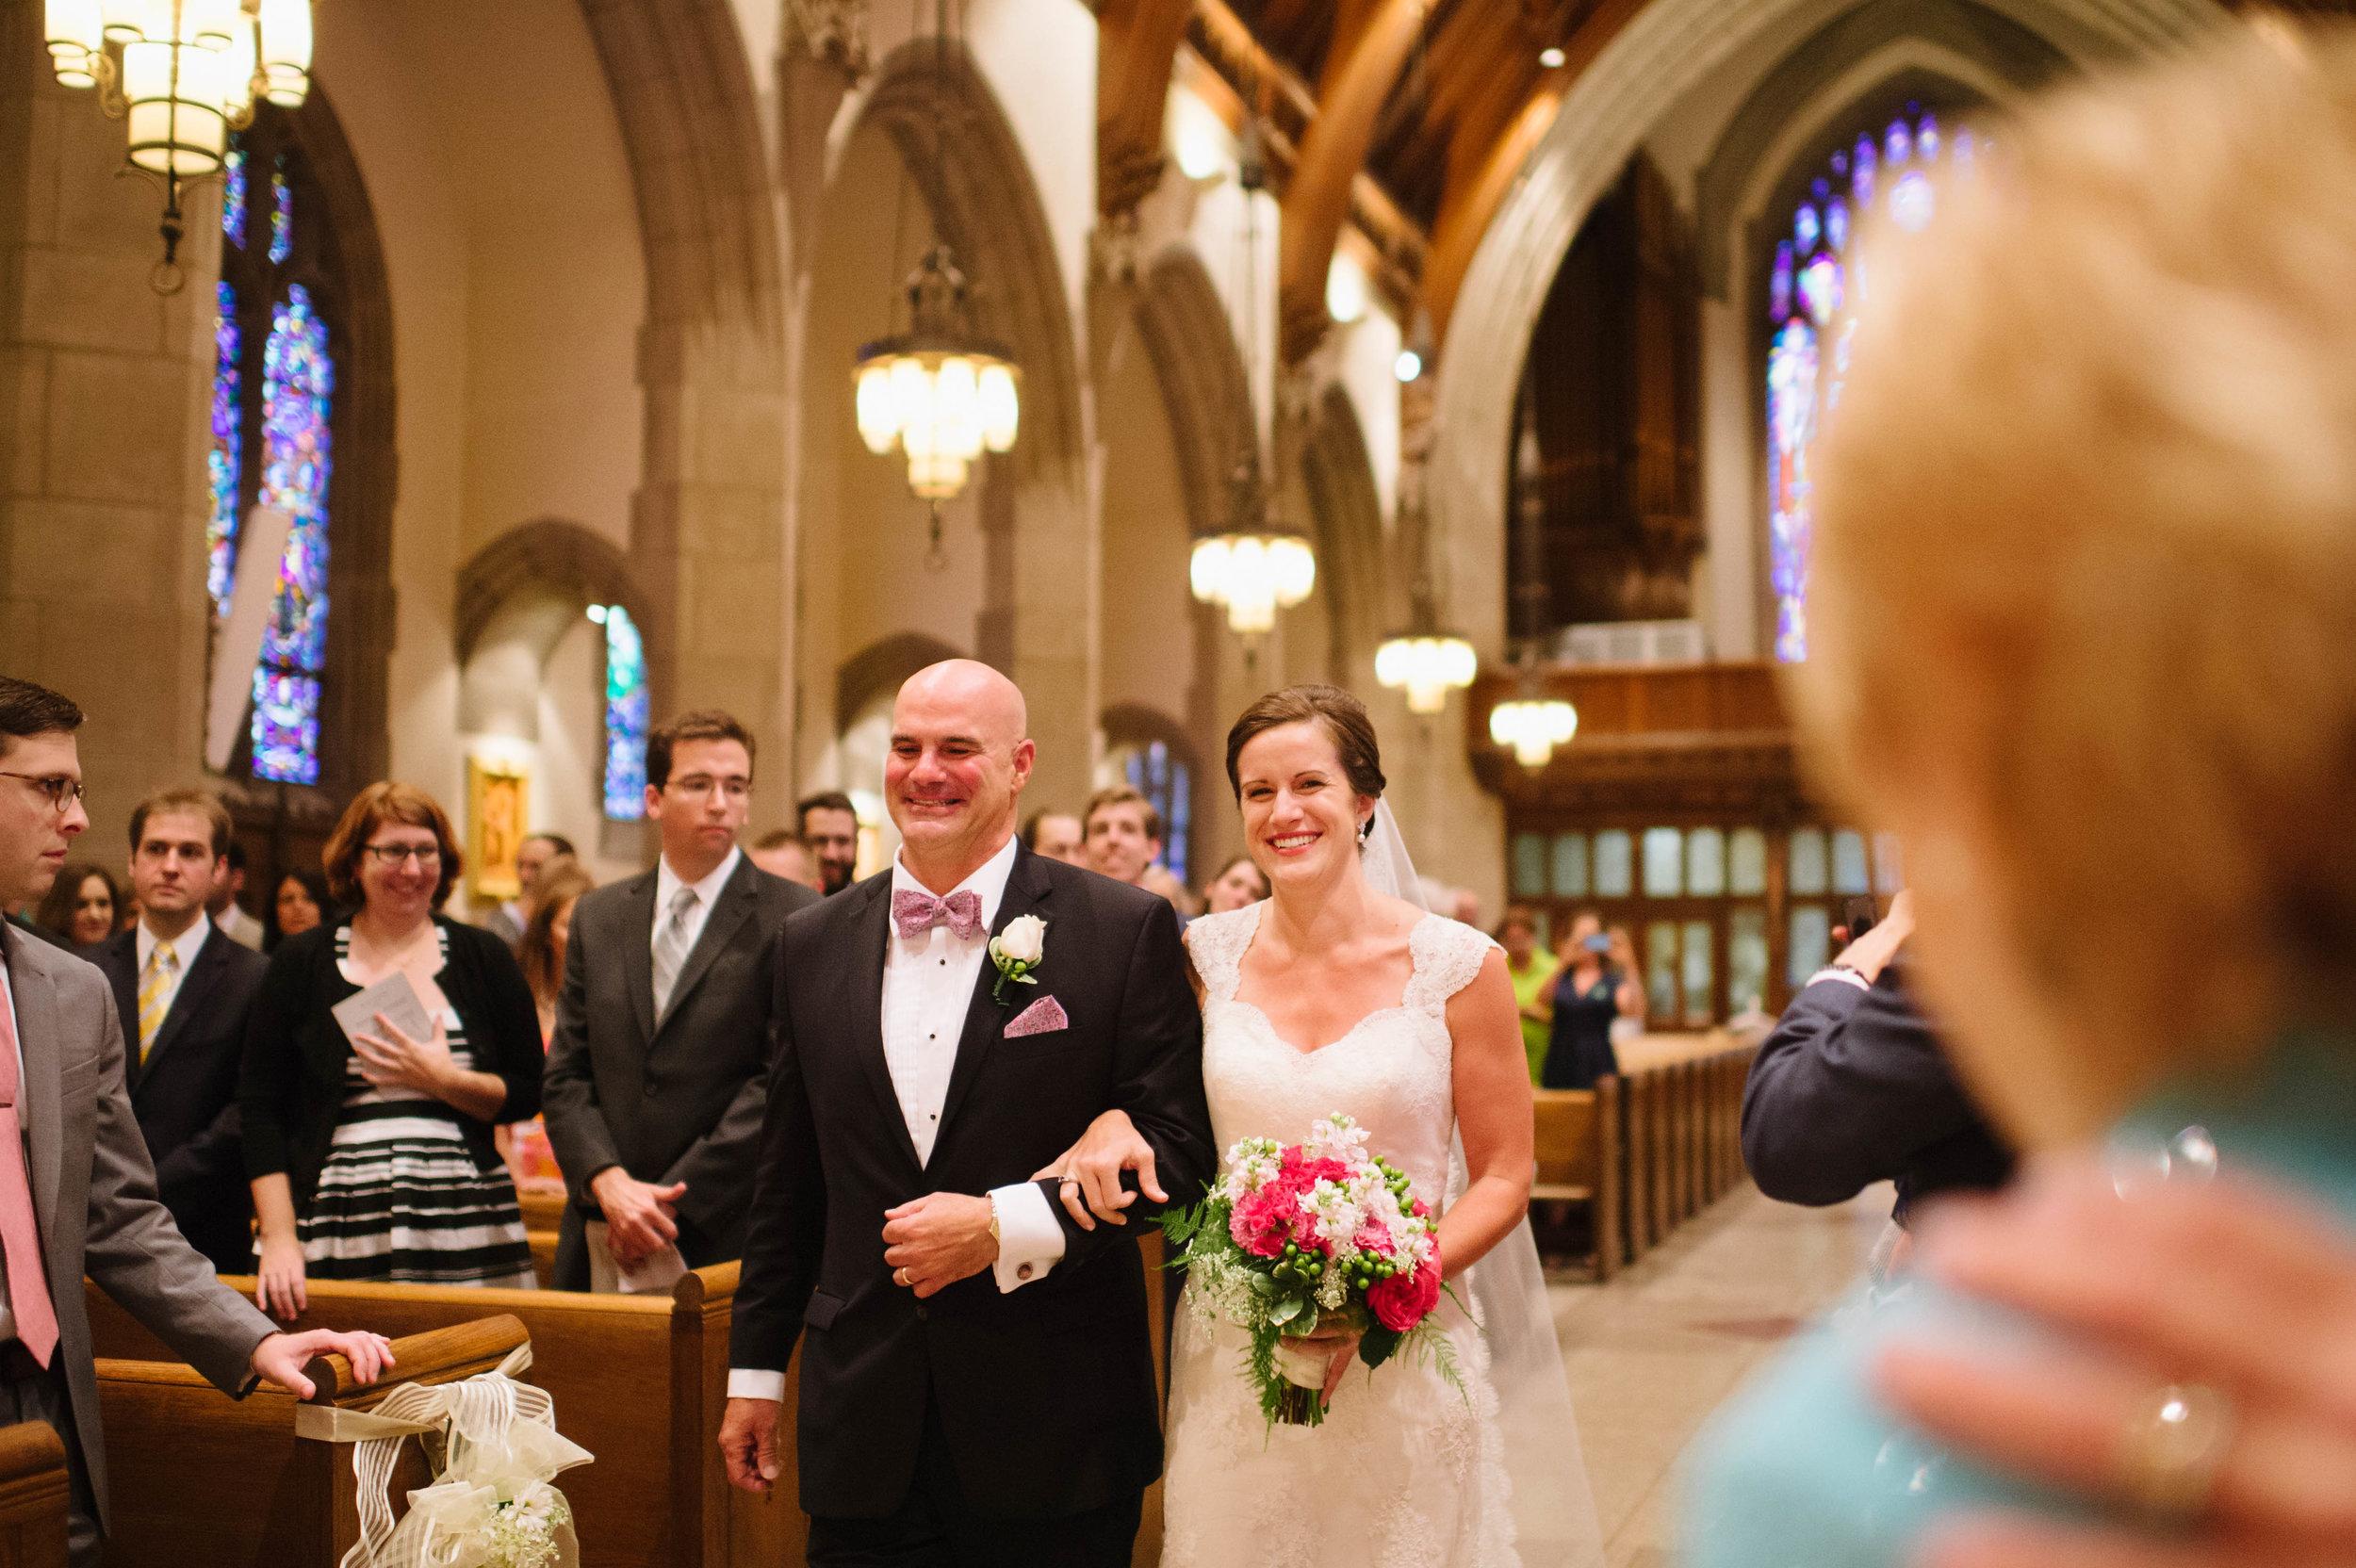 Creative_Wedding_Photography_Boston012.jpg